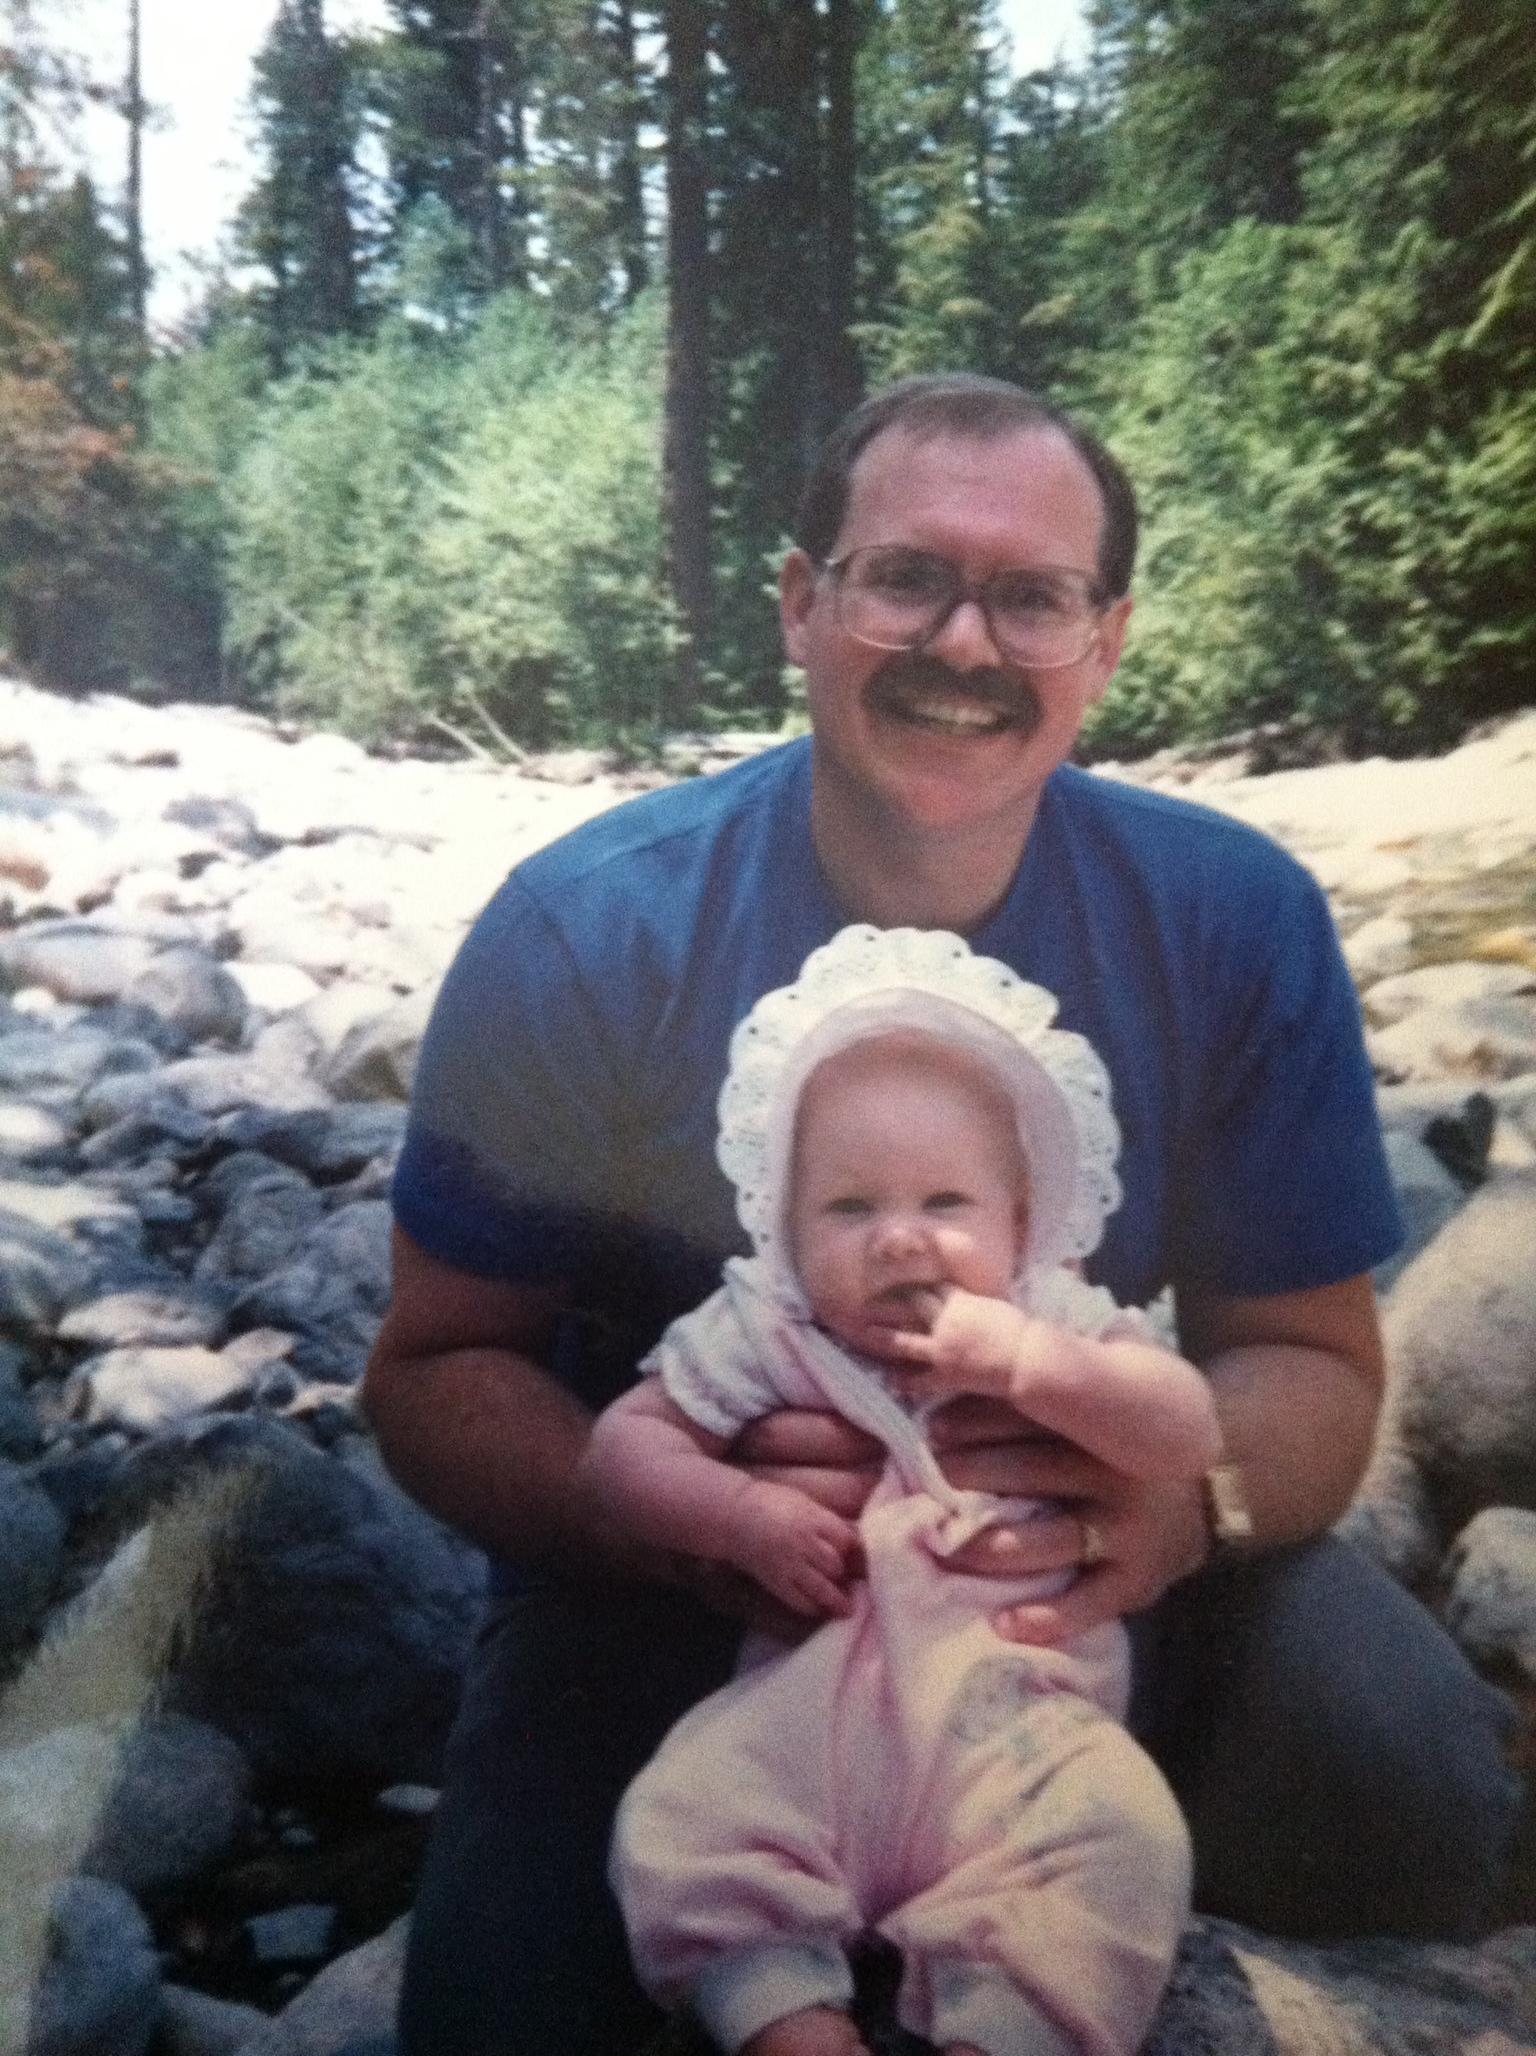 Me & my dad on a hike in wonderful Washington 1987ish